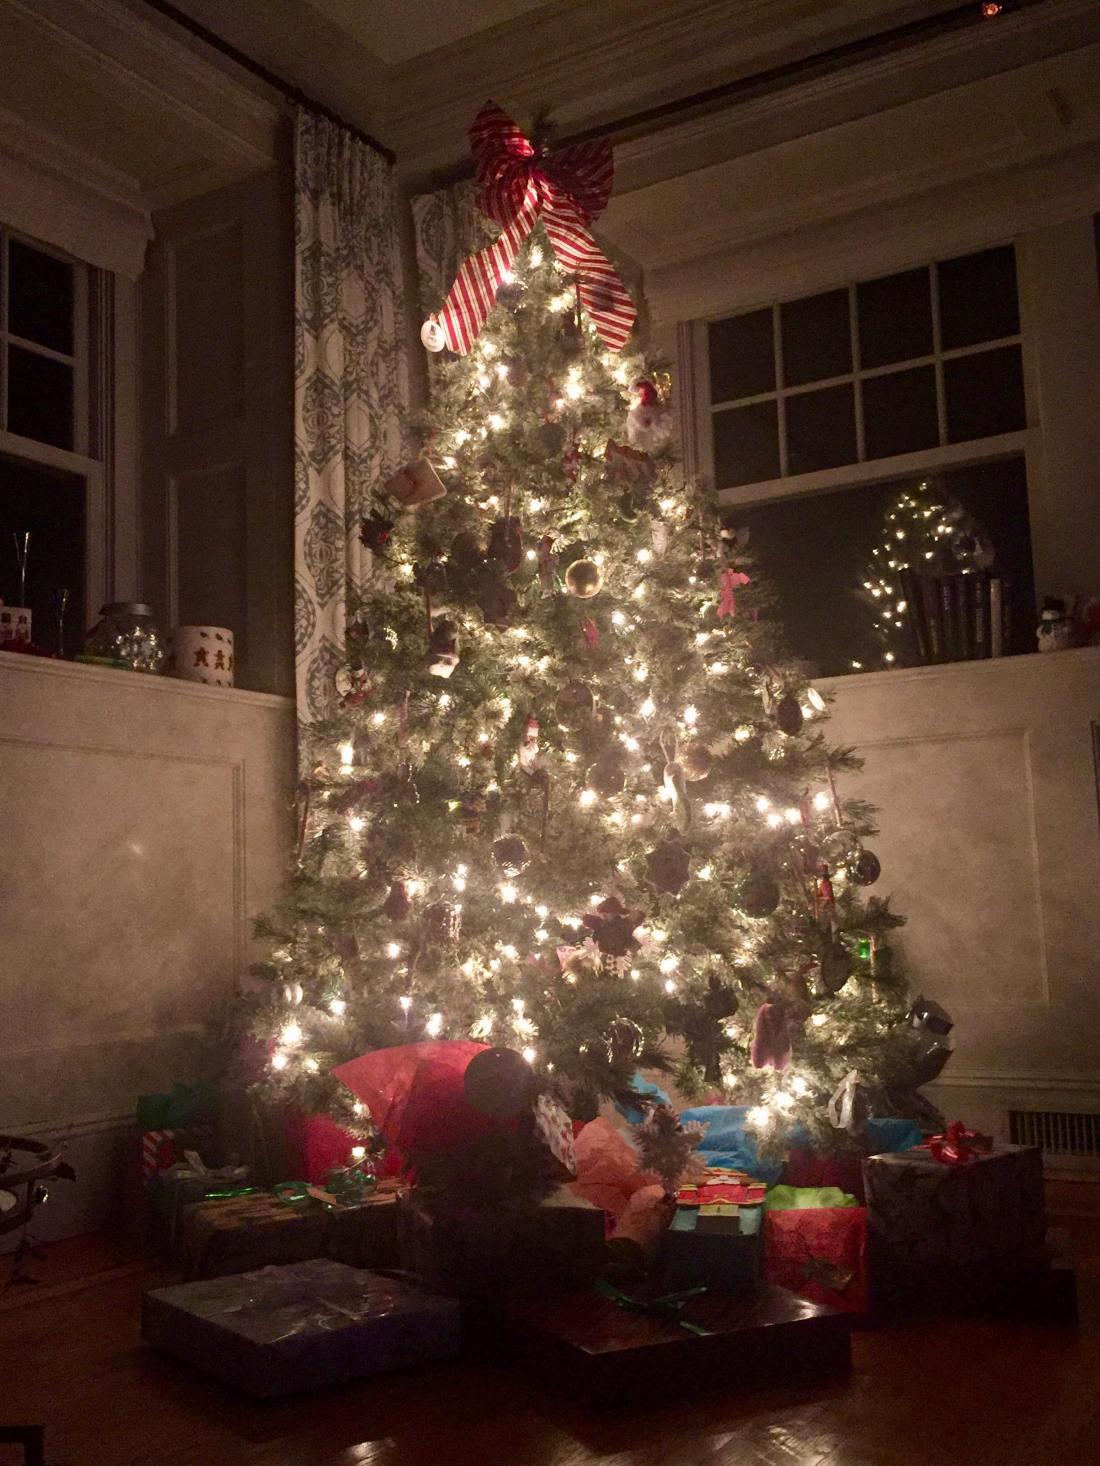 Immagini Natale Usa.Natale Negli Usa Geographically Unstable